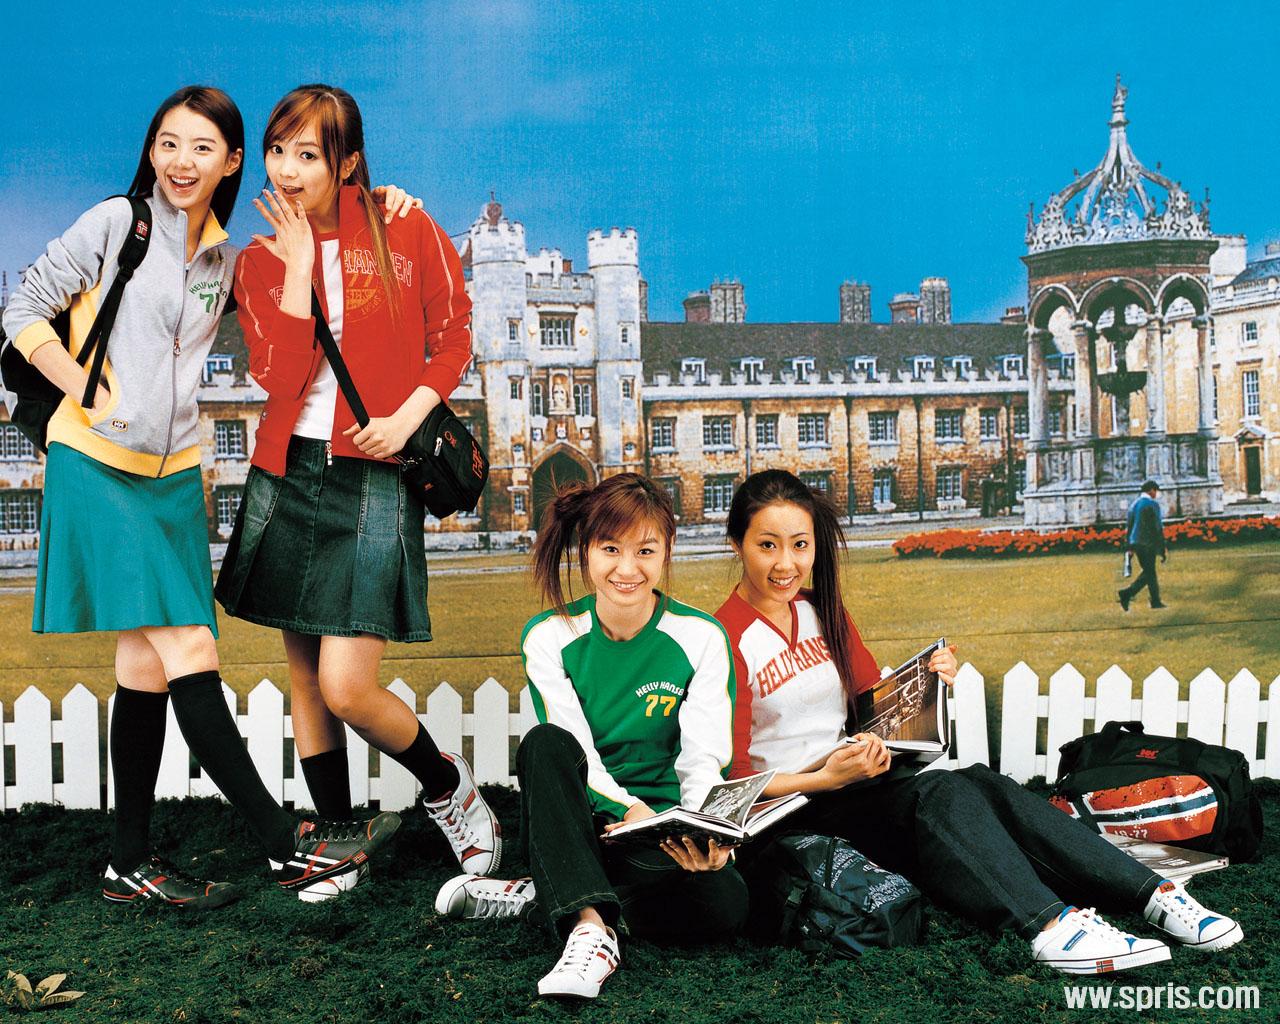 Sugar, k-pop girl group, Spris, sportswear, promo [PH201027083333]